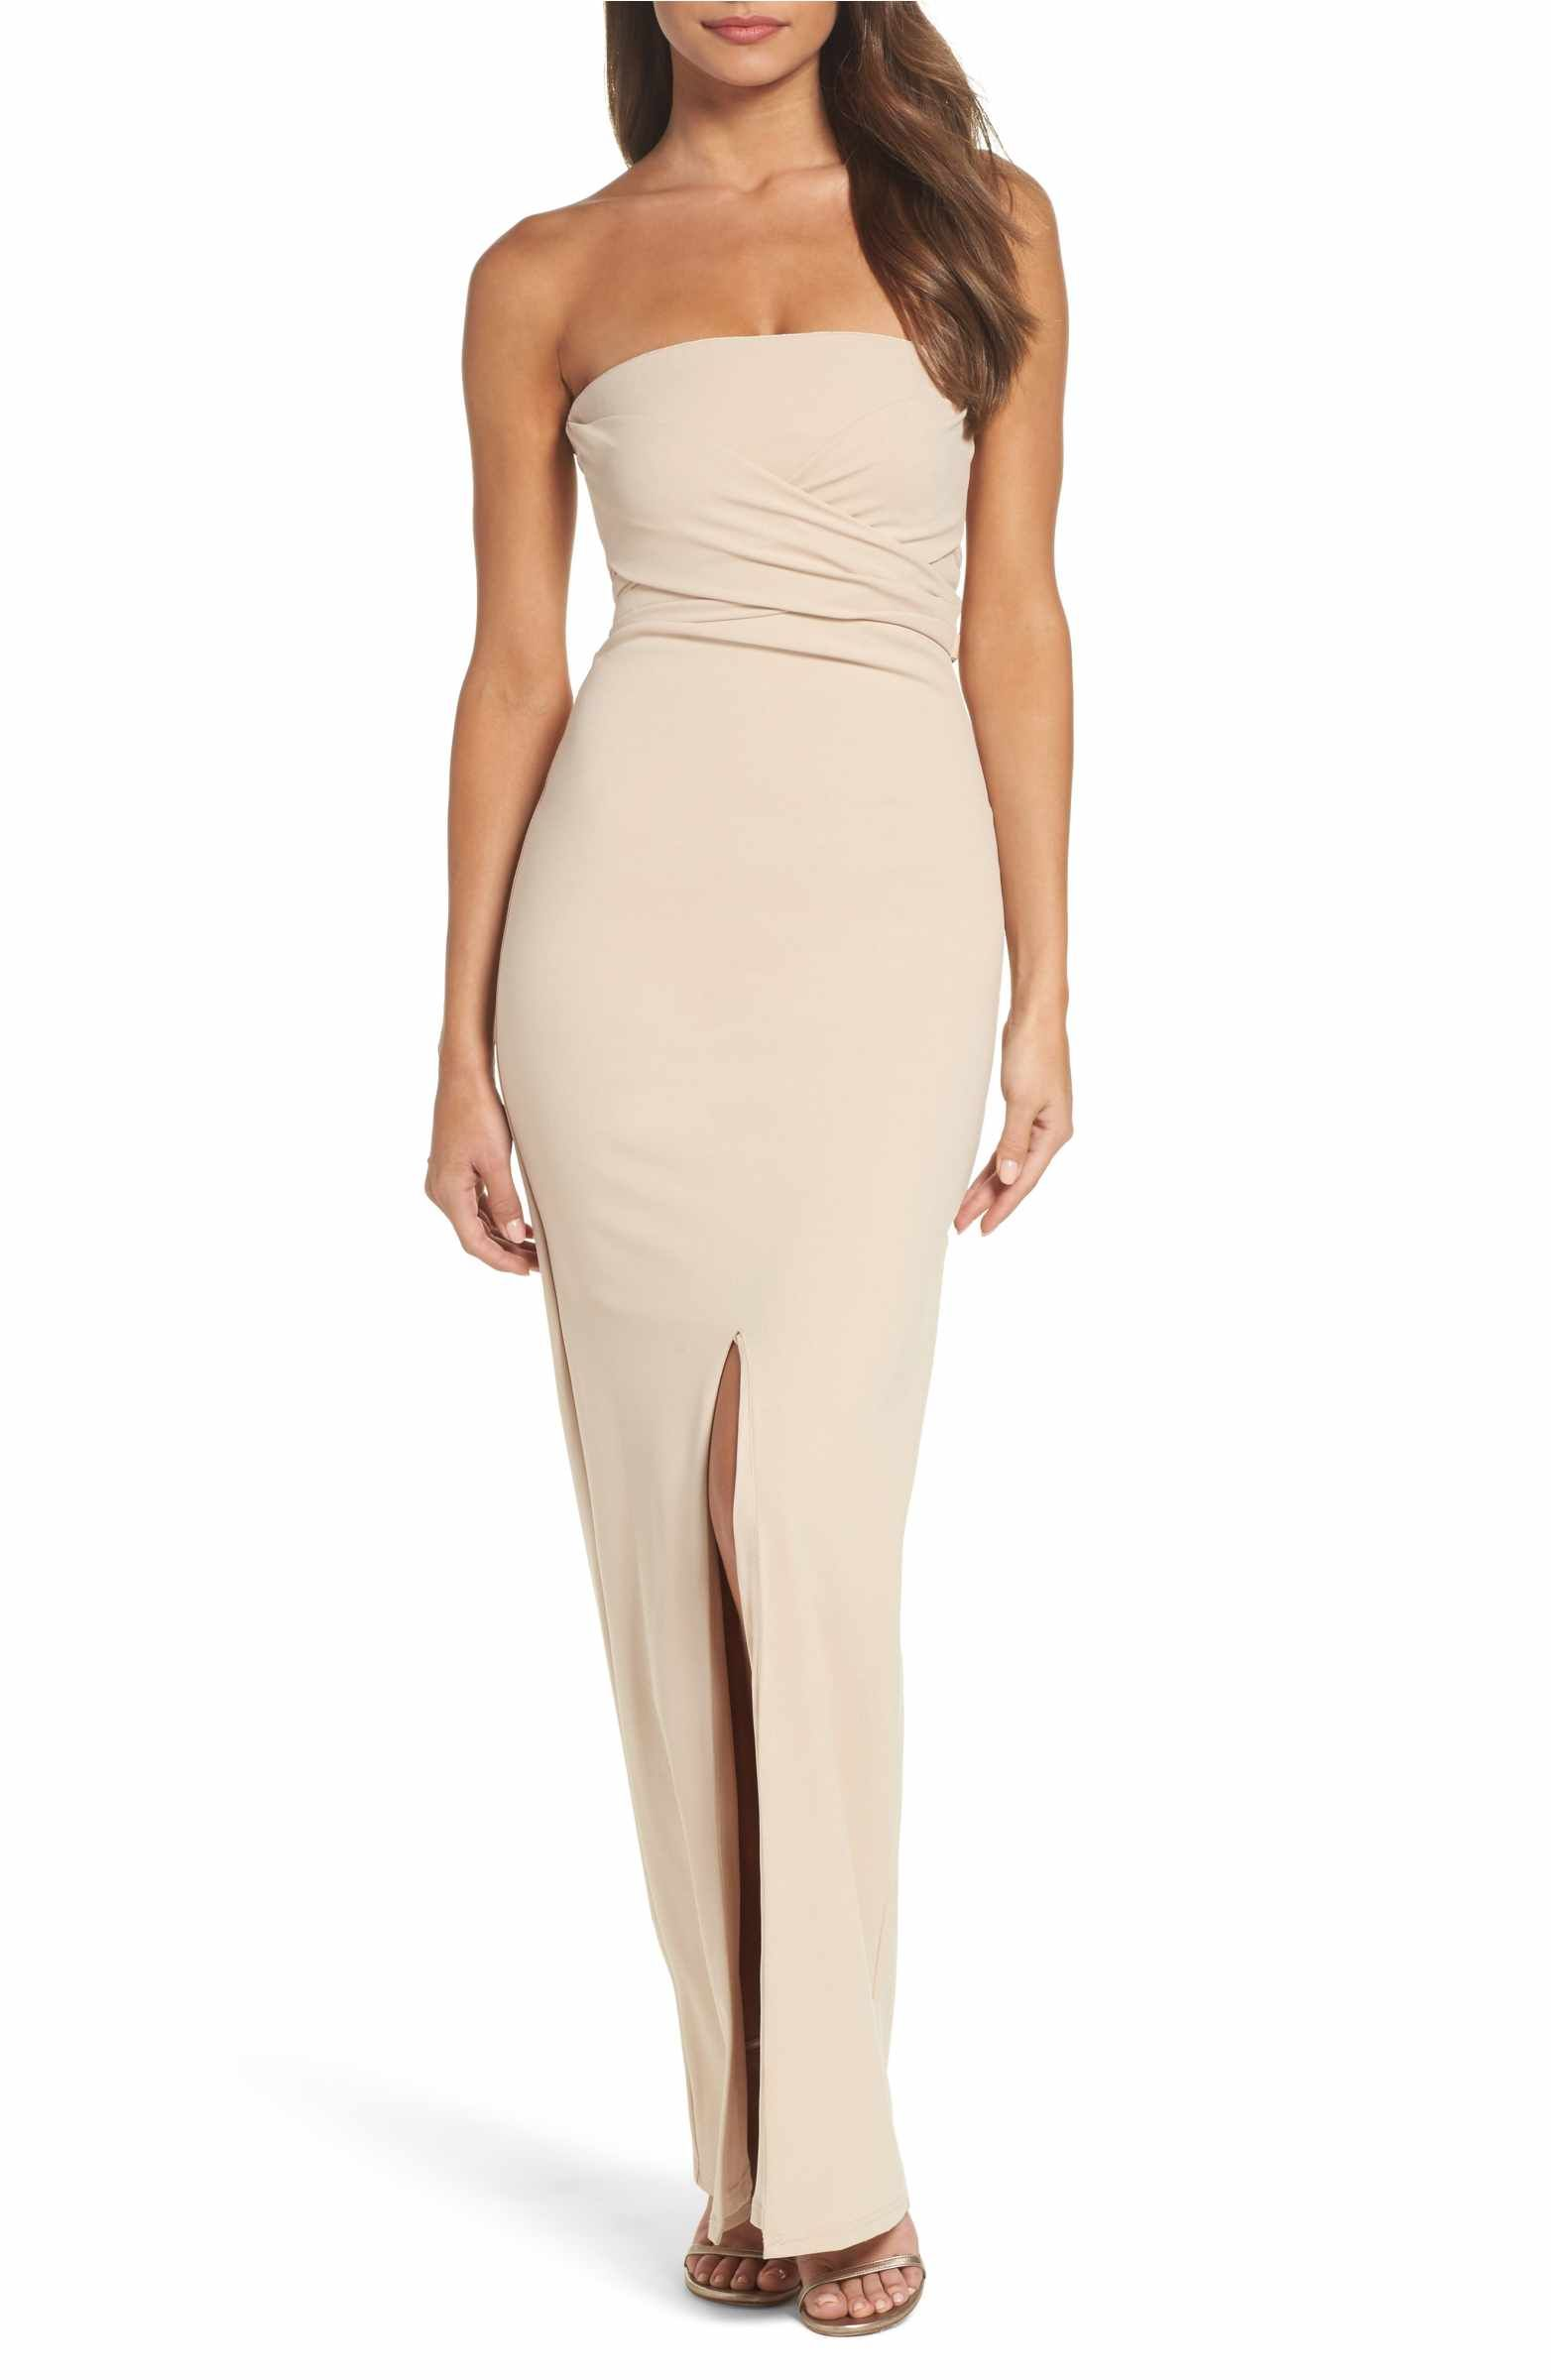 Main Image - Lulus Own the Night Strapless Maxi Dress  c8b1d9e23